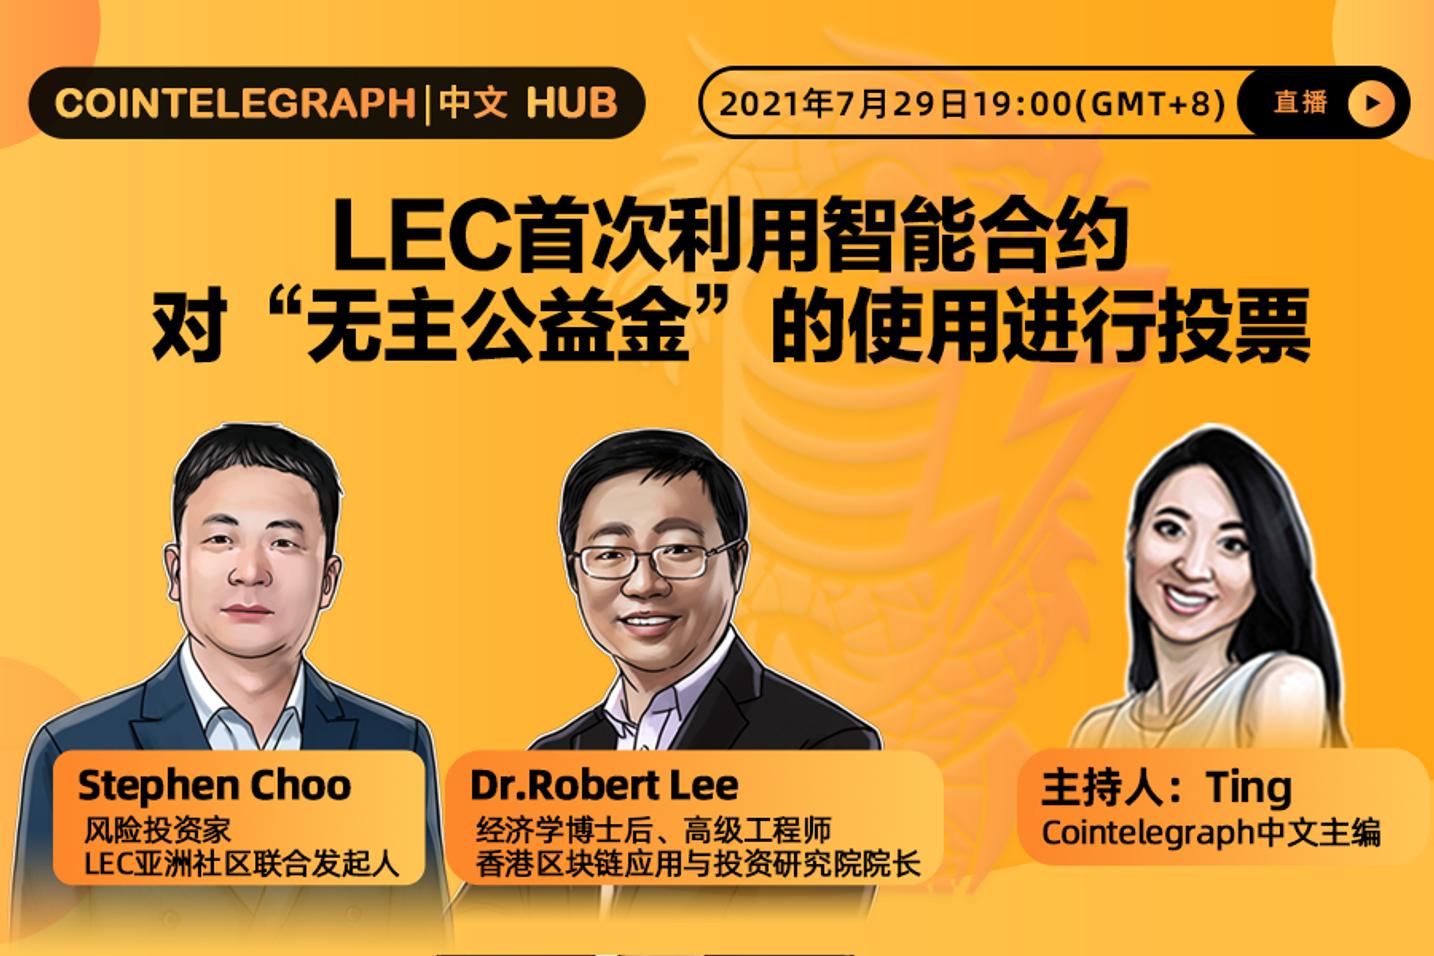 "Cointelegraph中文HUB   LEC首次利用智能合约对""无主公益金""的使用进行投票"